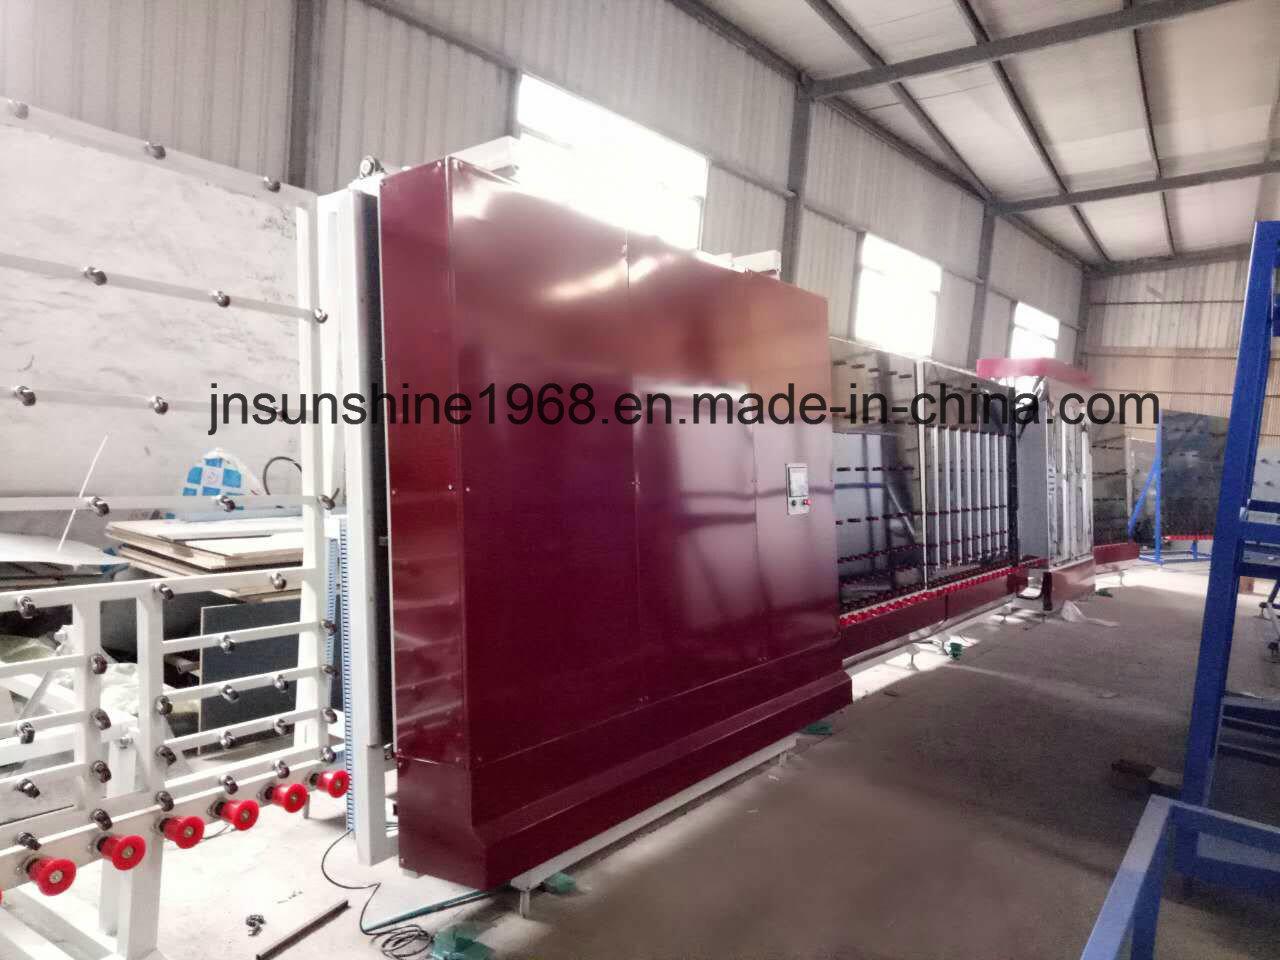 Insulating Glass Machine, Insulating Glass Production Line